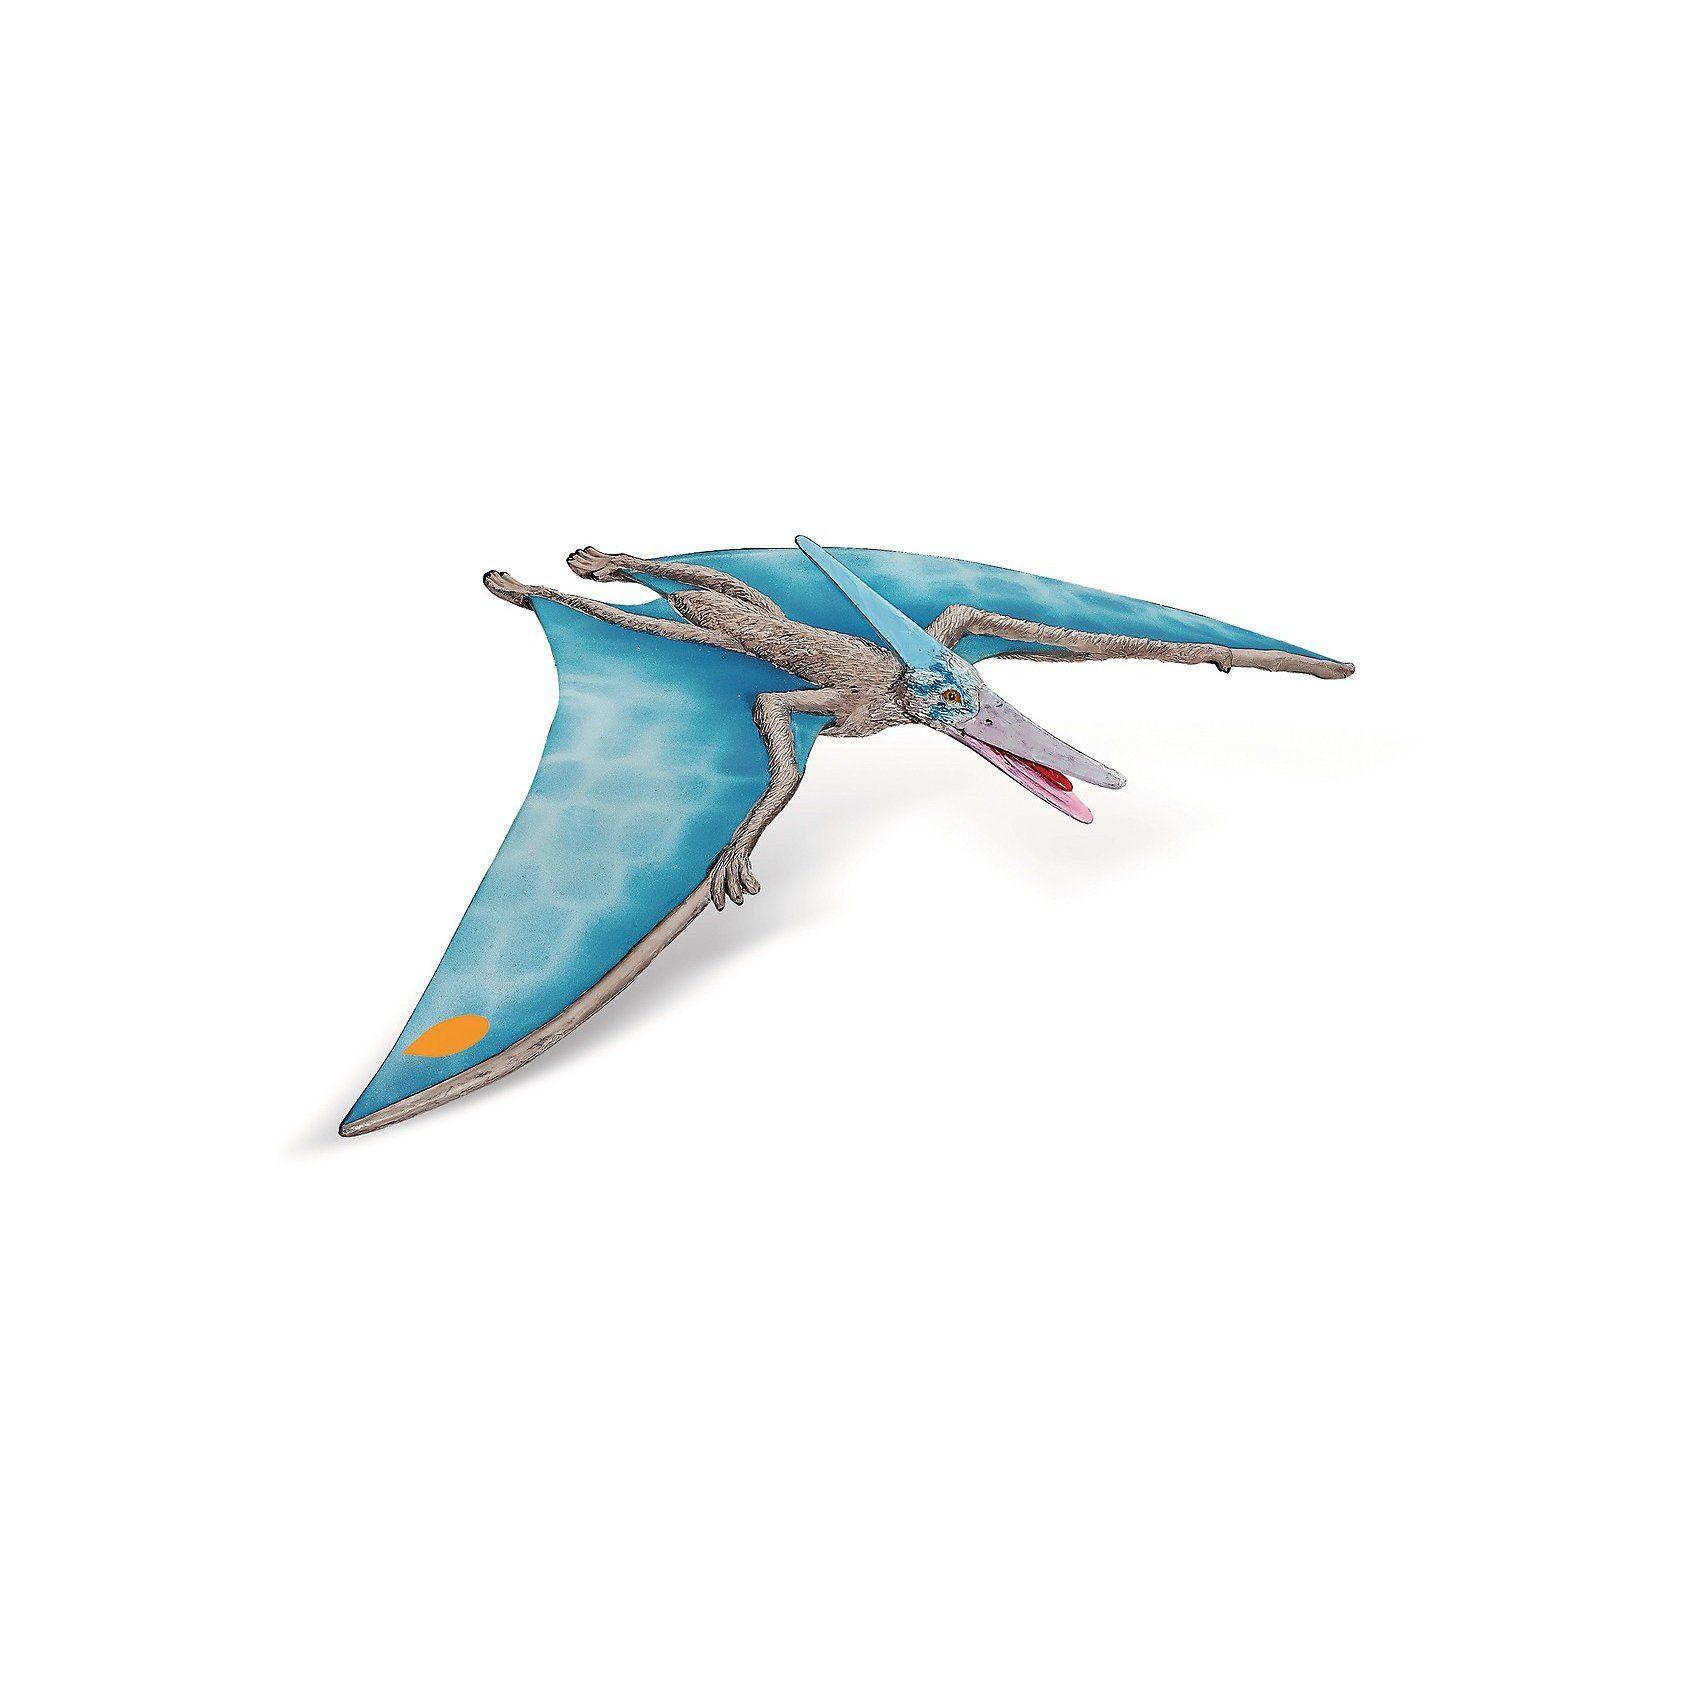 Ravensburger tiptoi® Dinosaurier Pteranodon